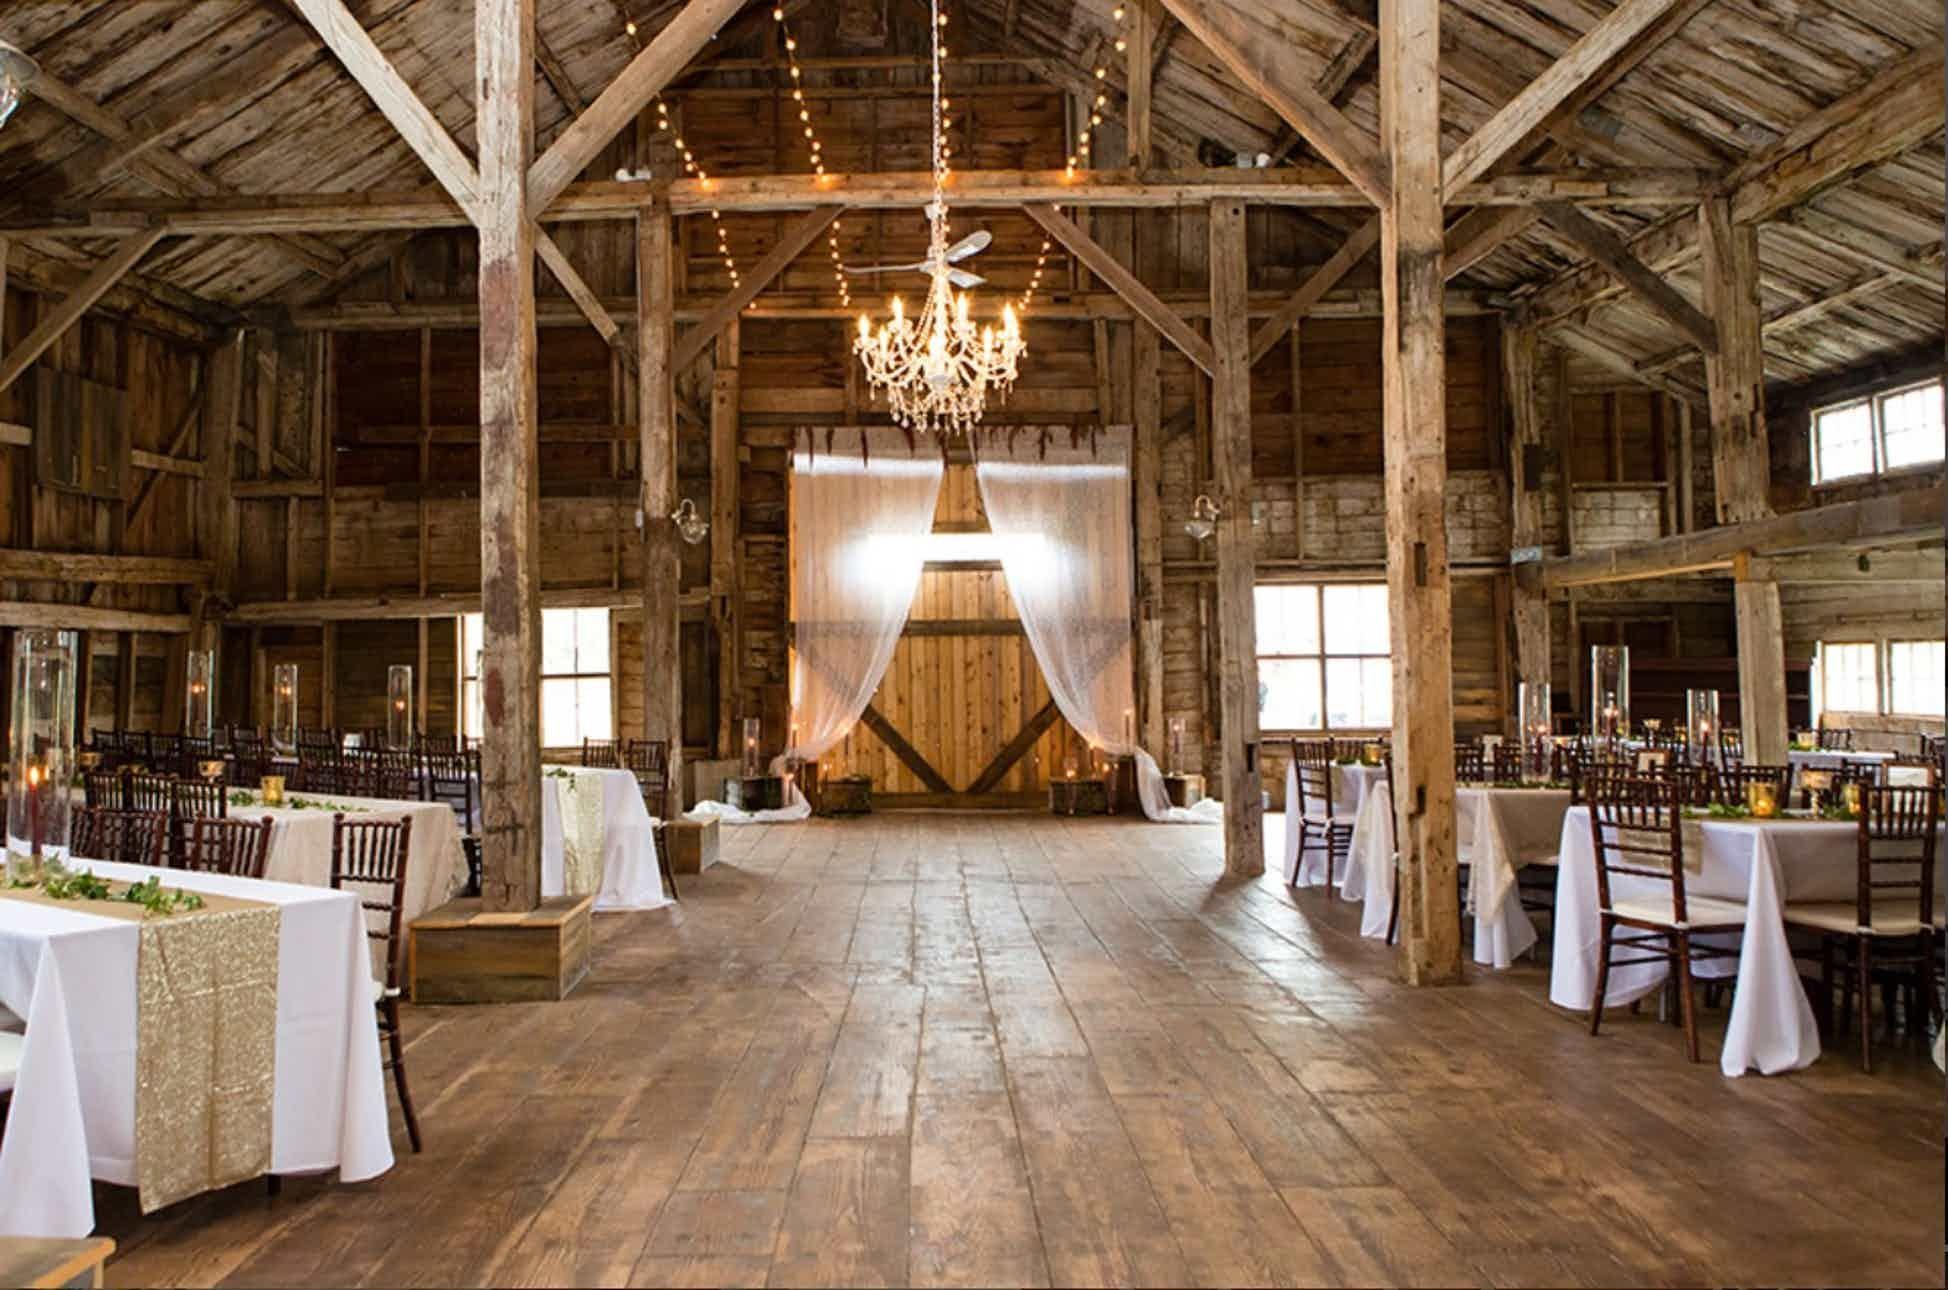 Maple Rock Farm Wedding Venue Parsonfield ME 04047 Barn